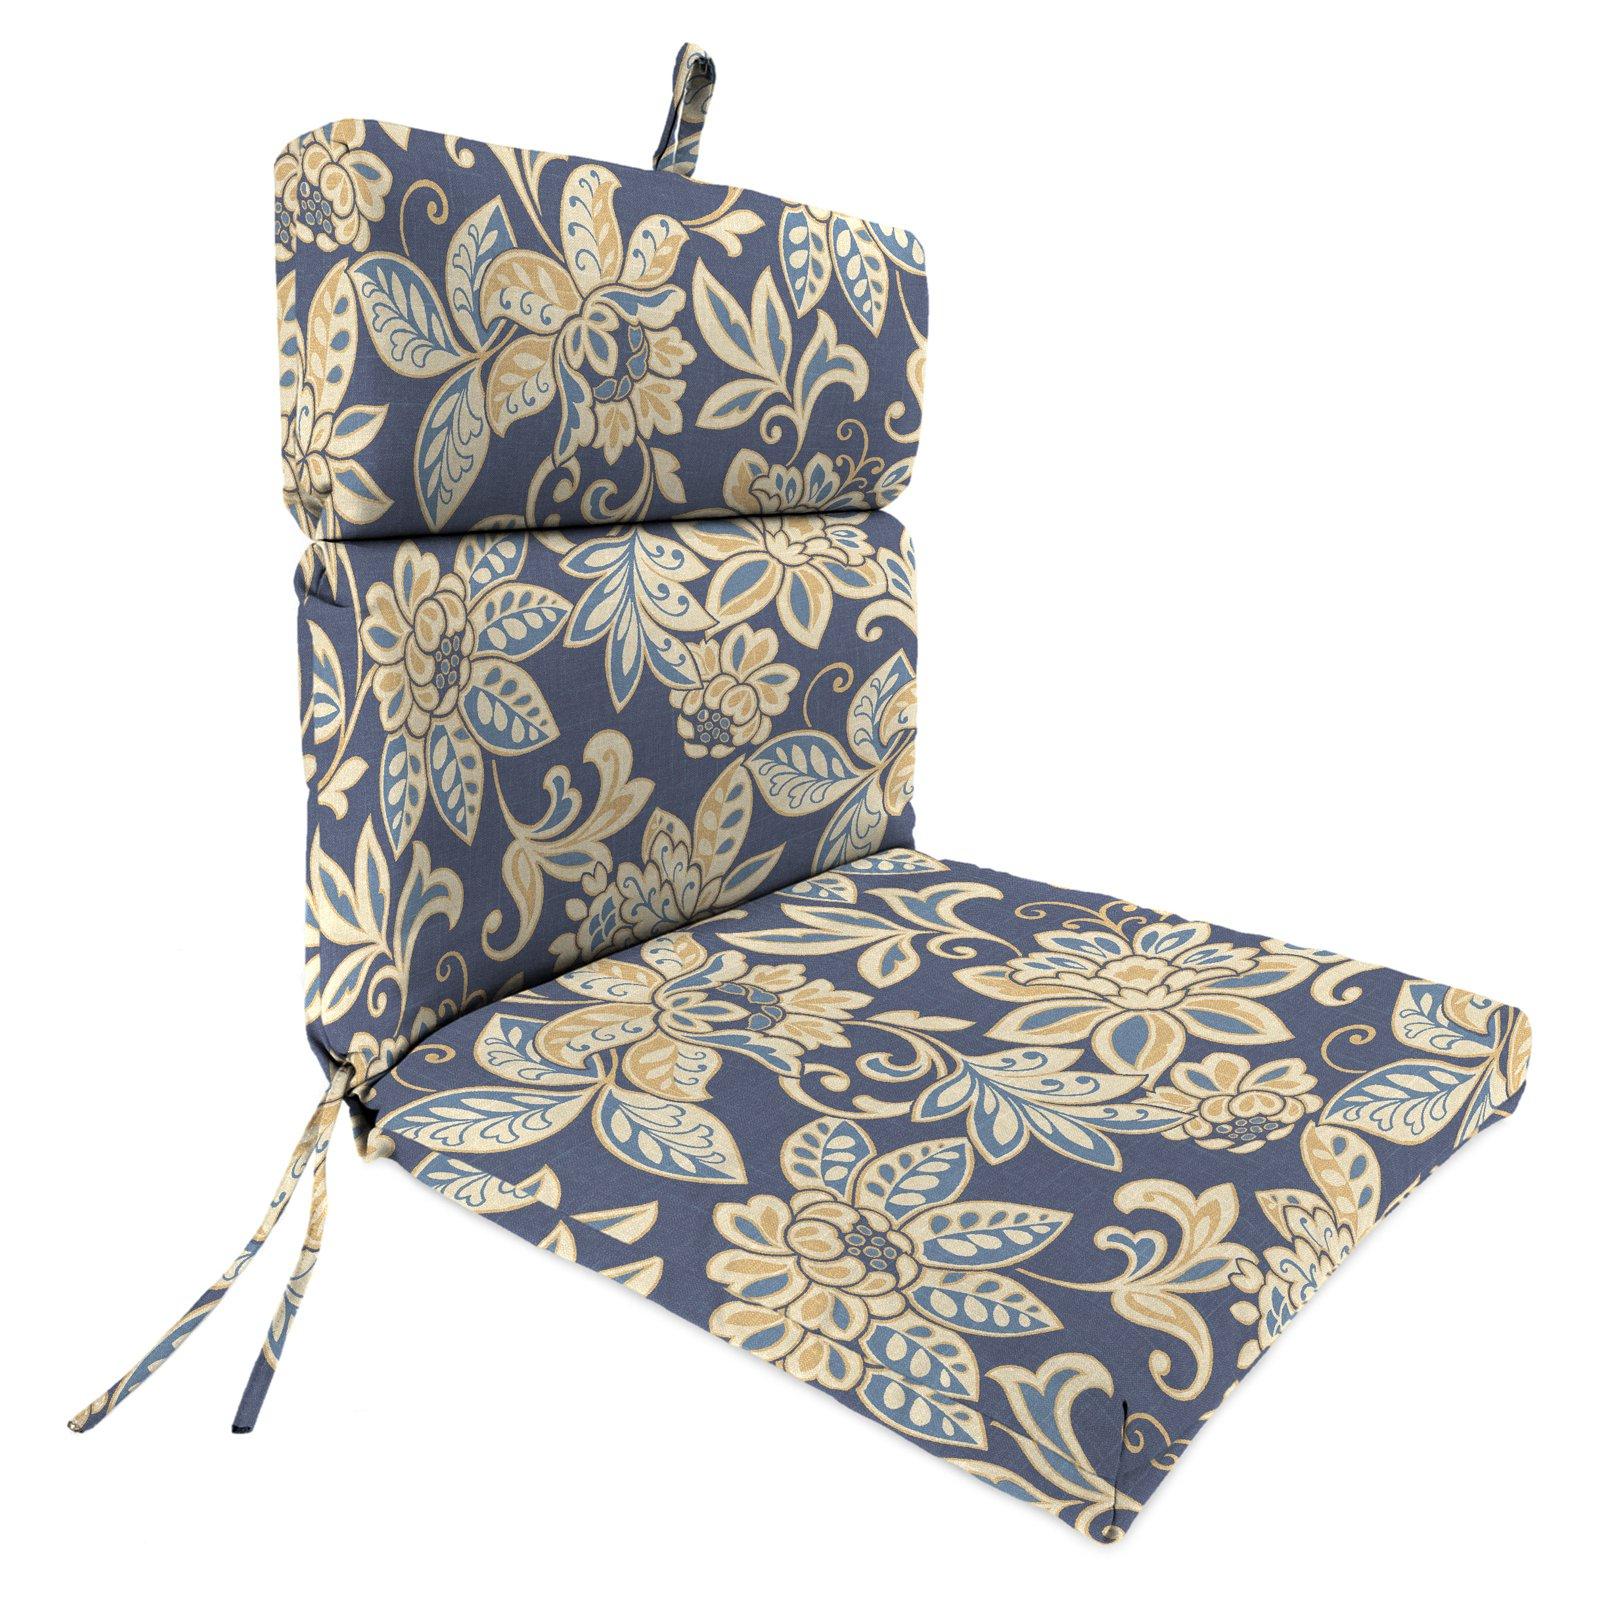 outdoor chair cushions jordan manufacturing 44 x 22 in. outdoor chair cushion - outdoor cushions  at hayneedle YSTOVUV